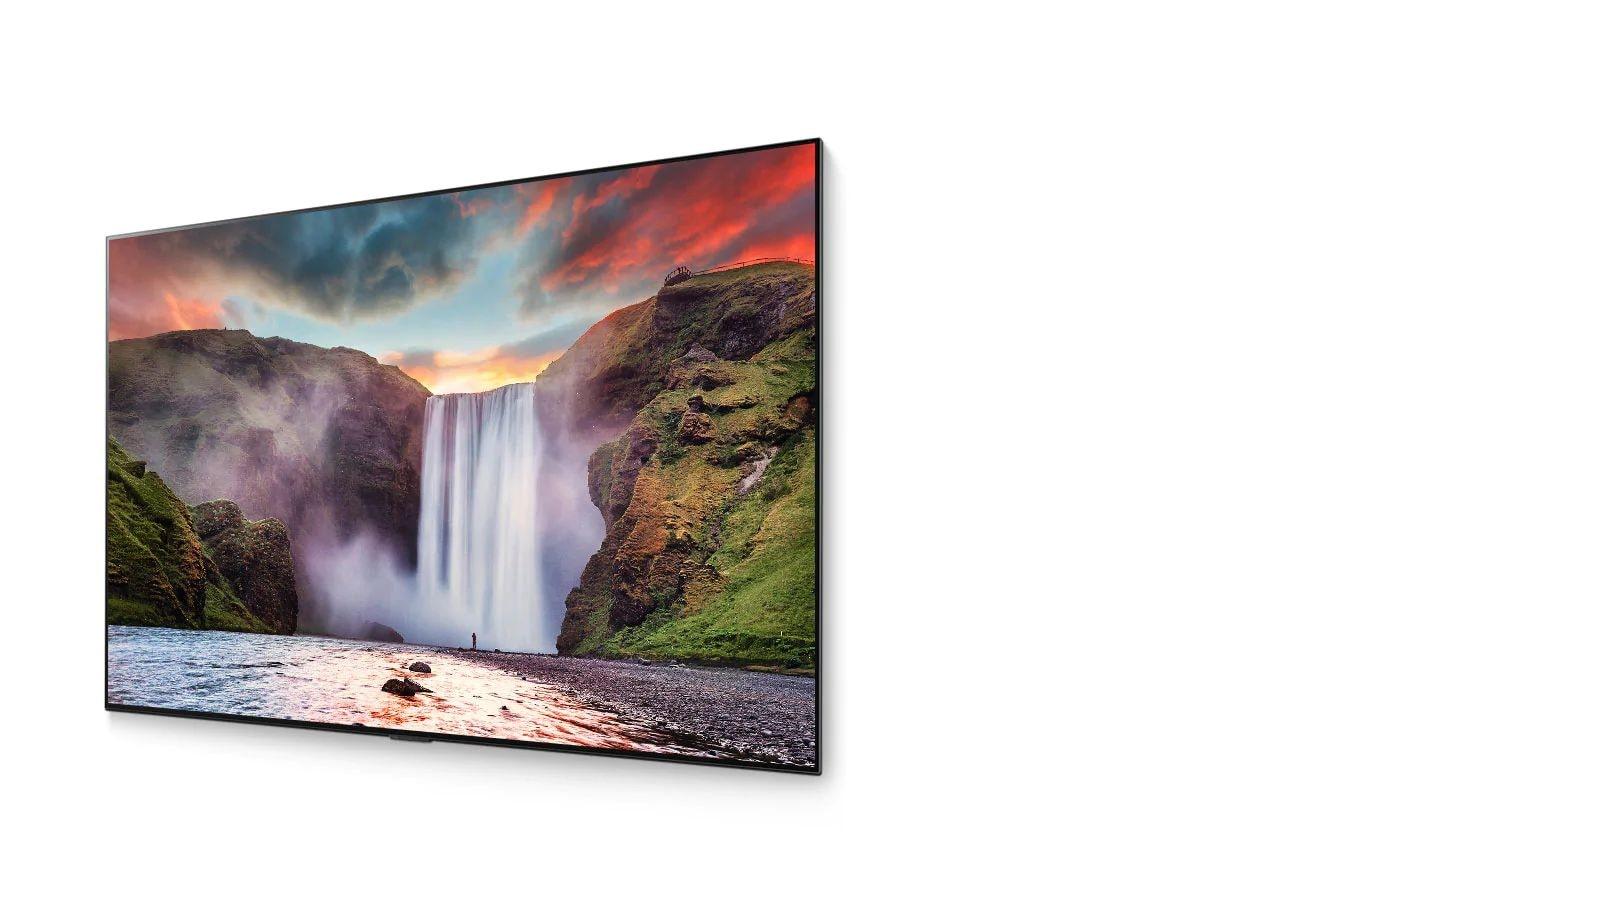 Un TV OLED muestra una cascada espectacular con un bonito paisaje (reproducir el vídeo)